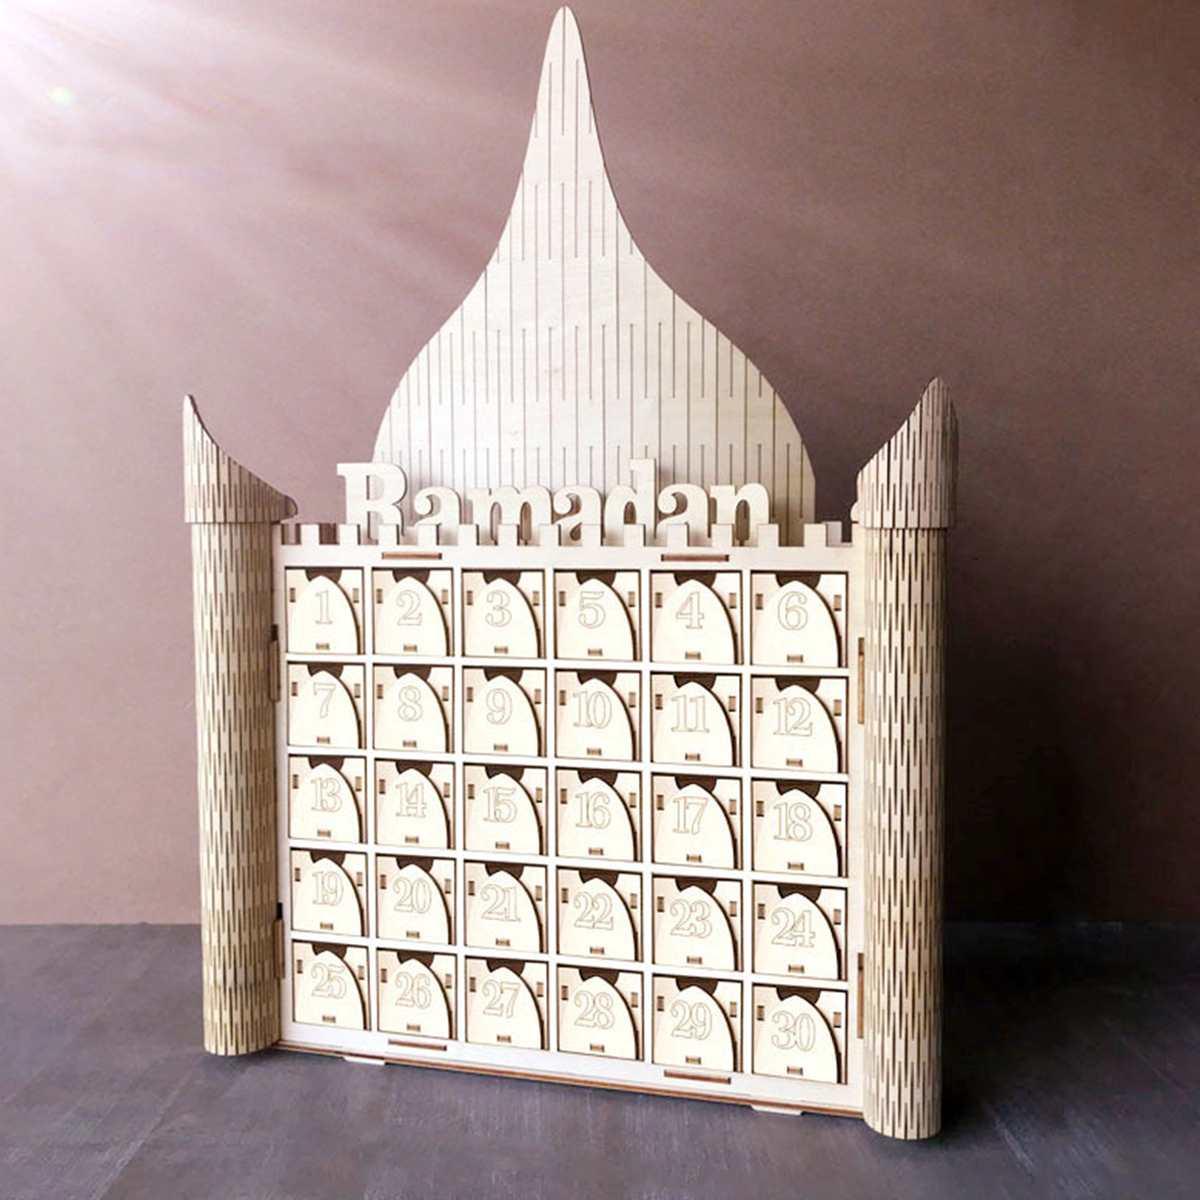 Wooden MDF DIY Drawer Ramadan Calendar EID Mubarak Advent Decor Islamic Decoration Ramadan Muslim Festival Party Supplies